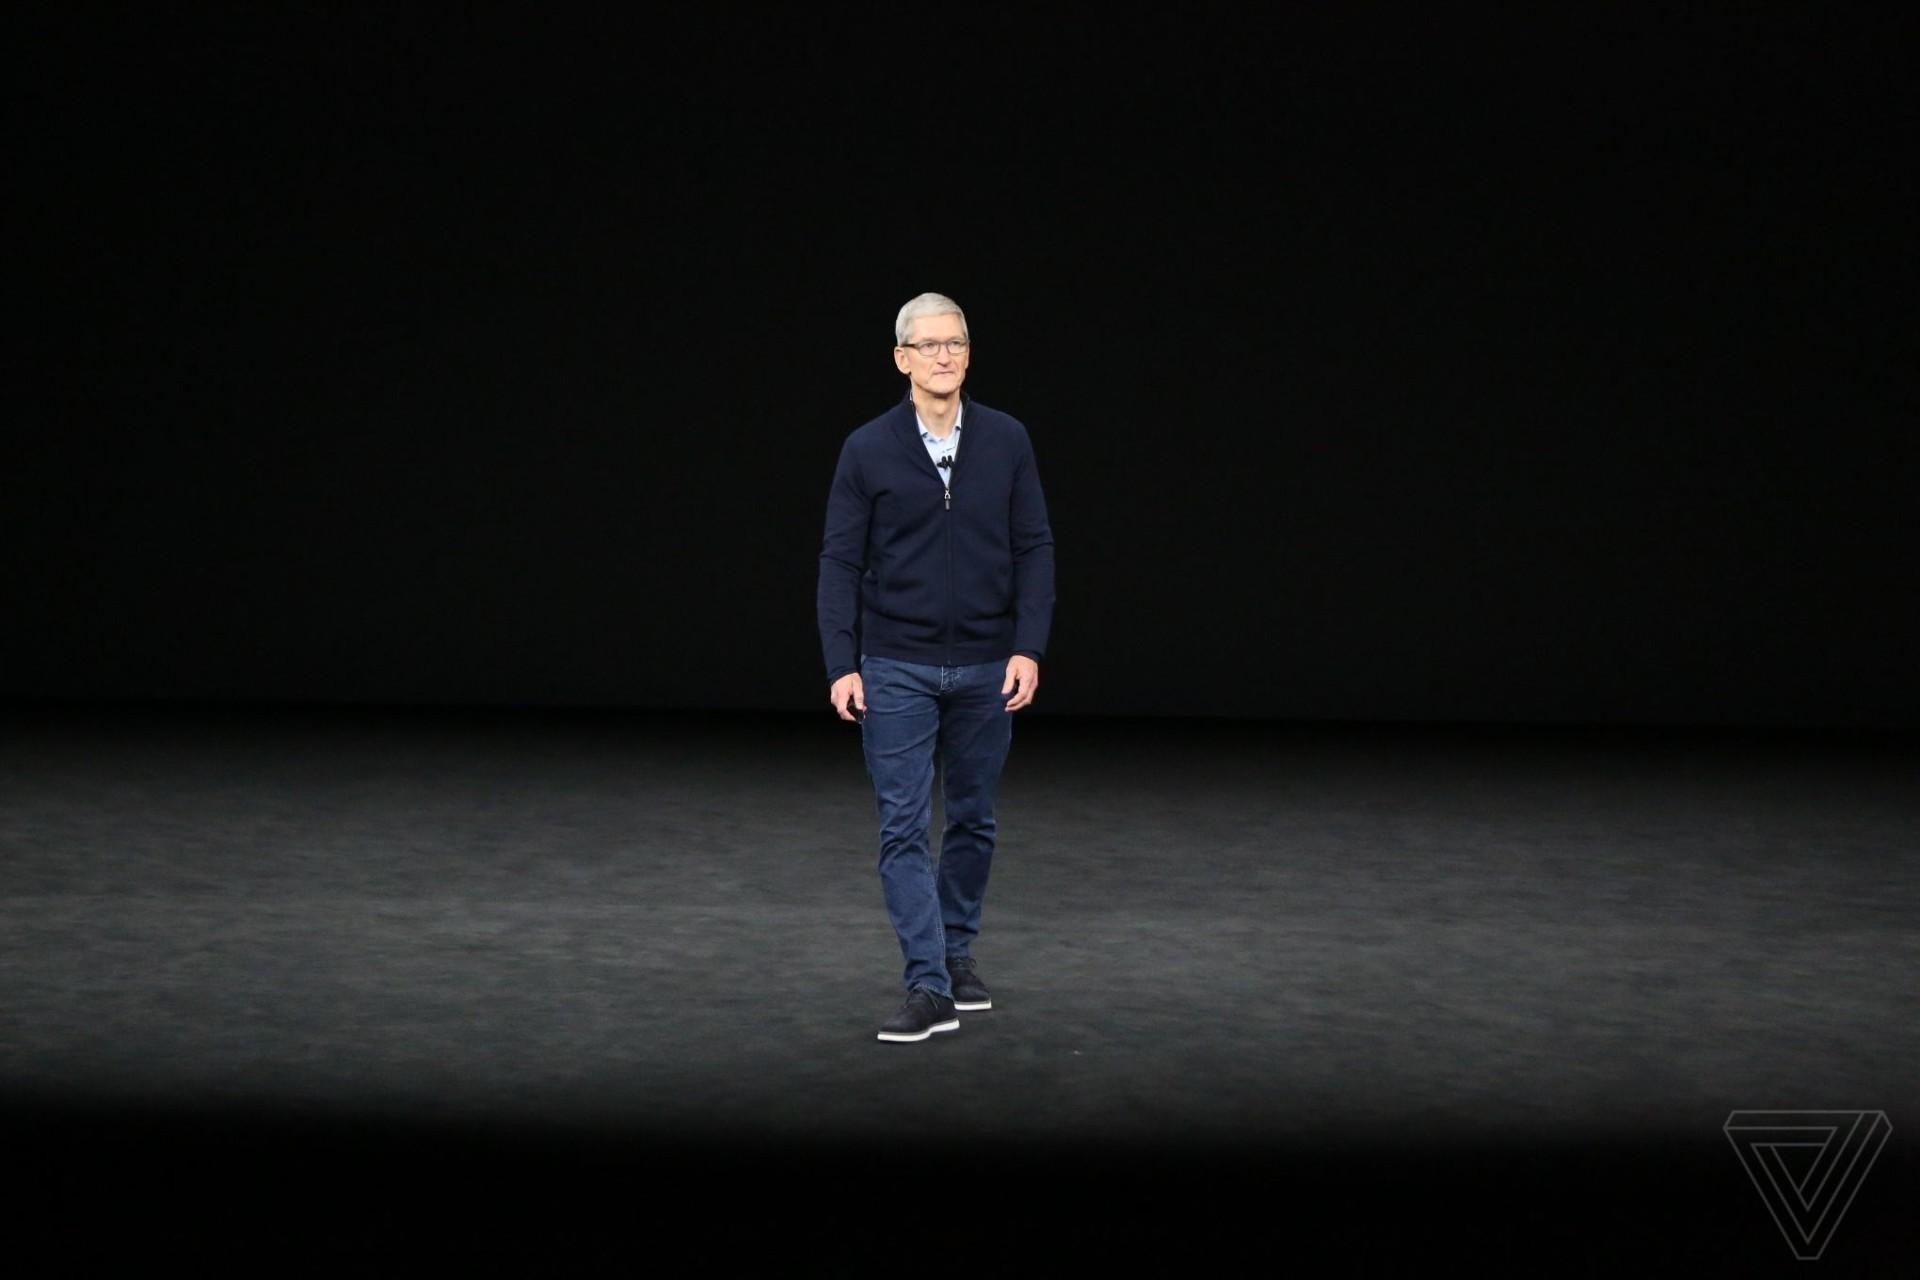 iPhone X在中国开售5小时卖550万部 苹果疯狂吸金461.3亿